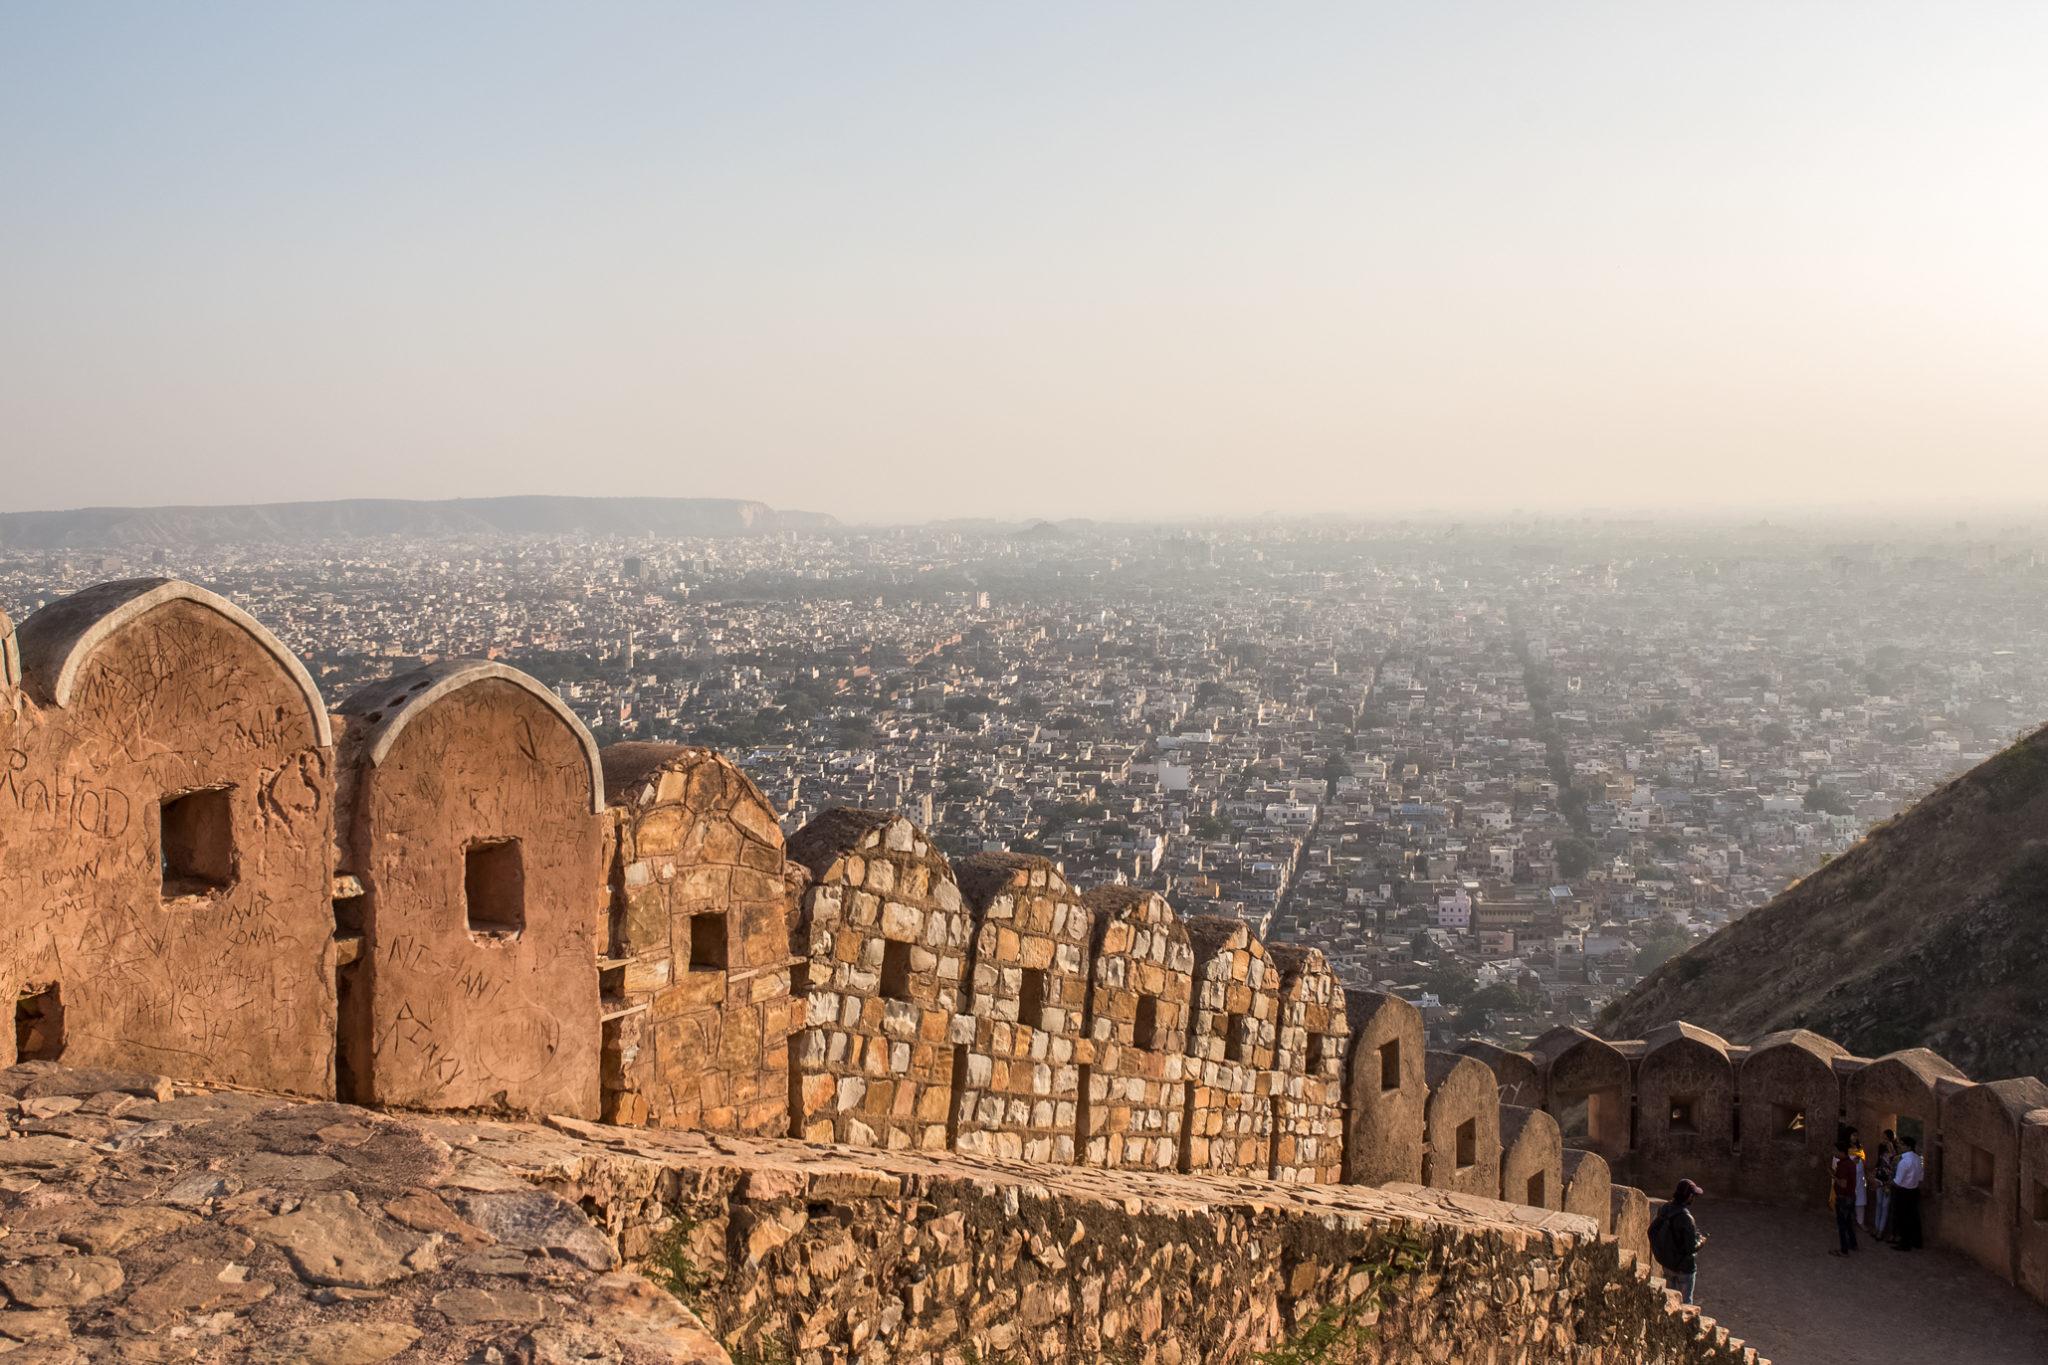 Fort-Jaigarh-inde-jaipur-visite-voyage